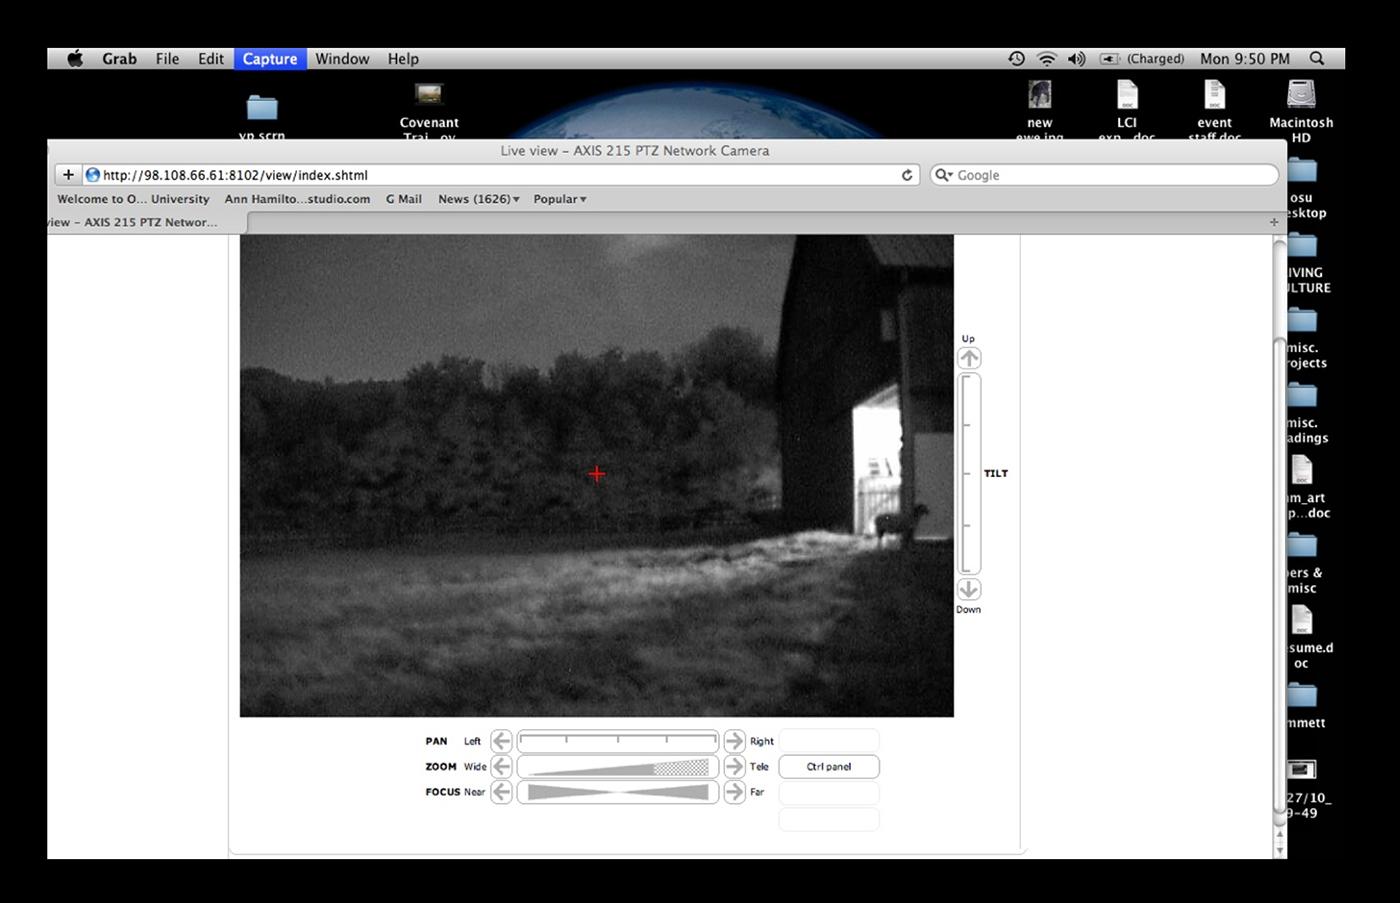 Desktop screen capture  9:50pm 28 June 2010